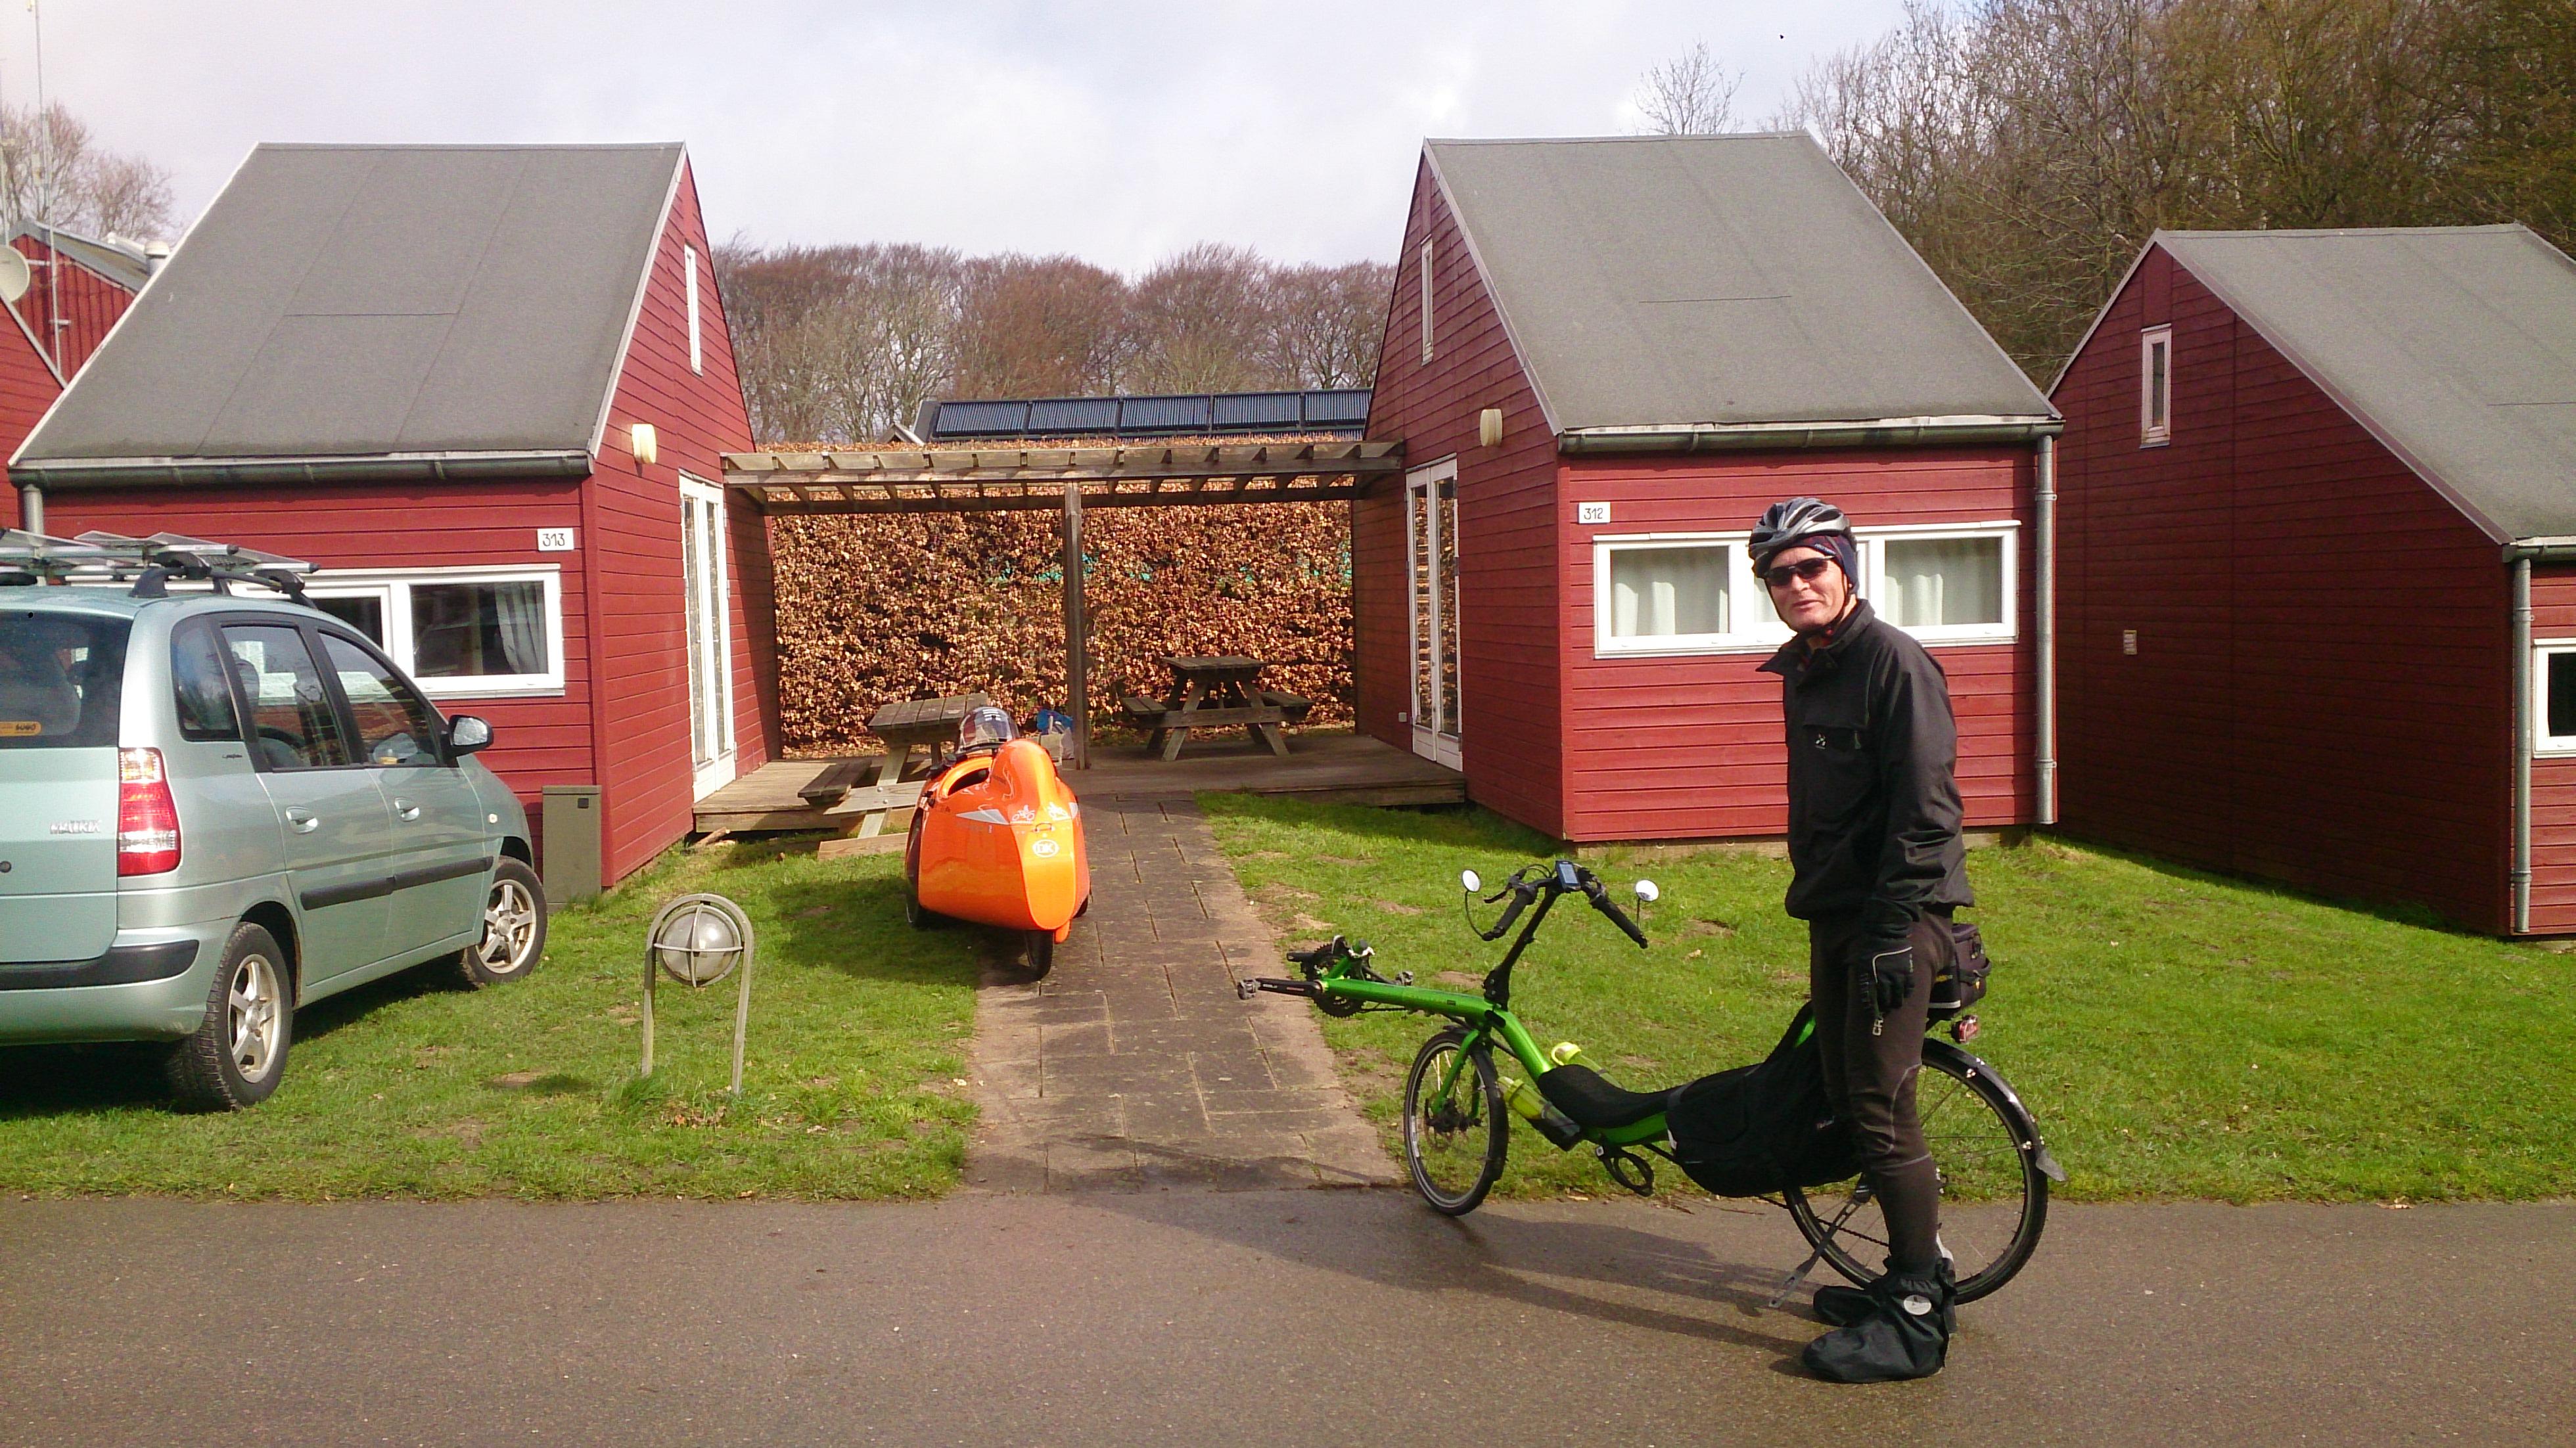 Liggecykel tur søndag, tilbage ved hytter